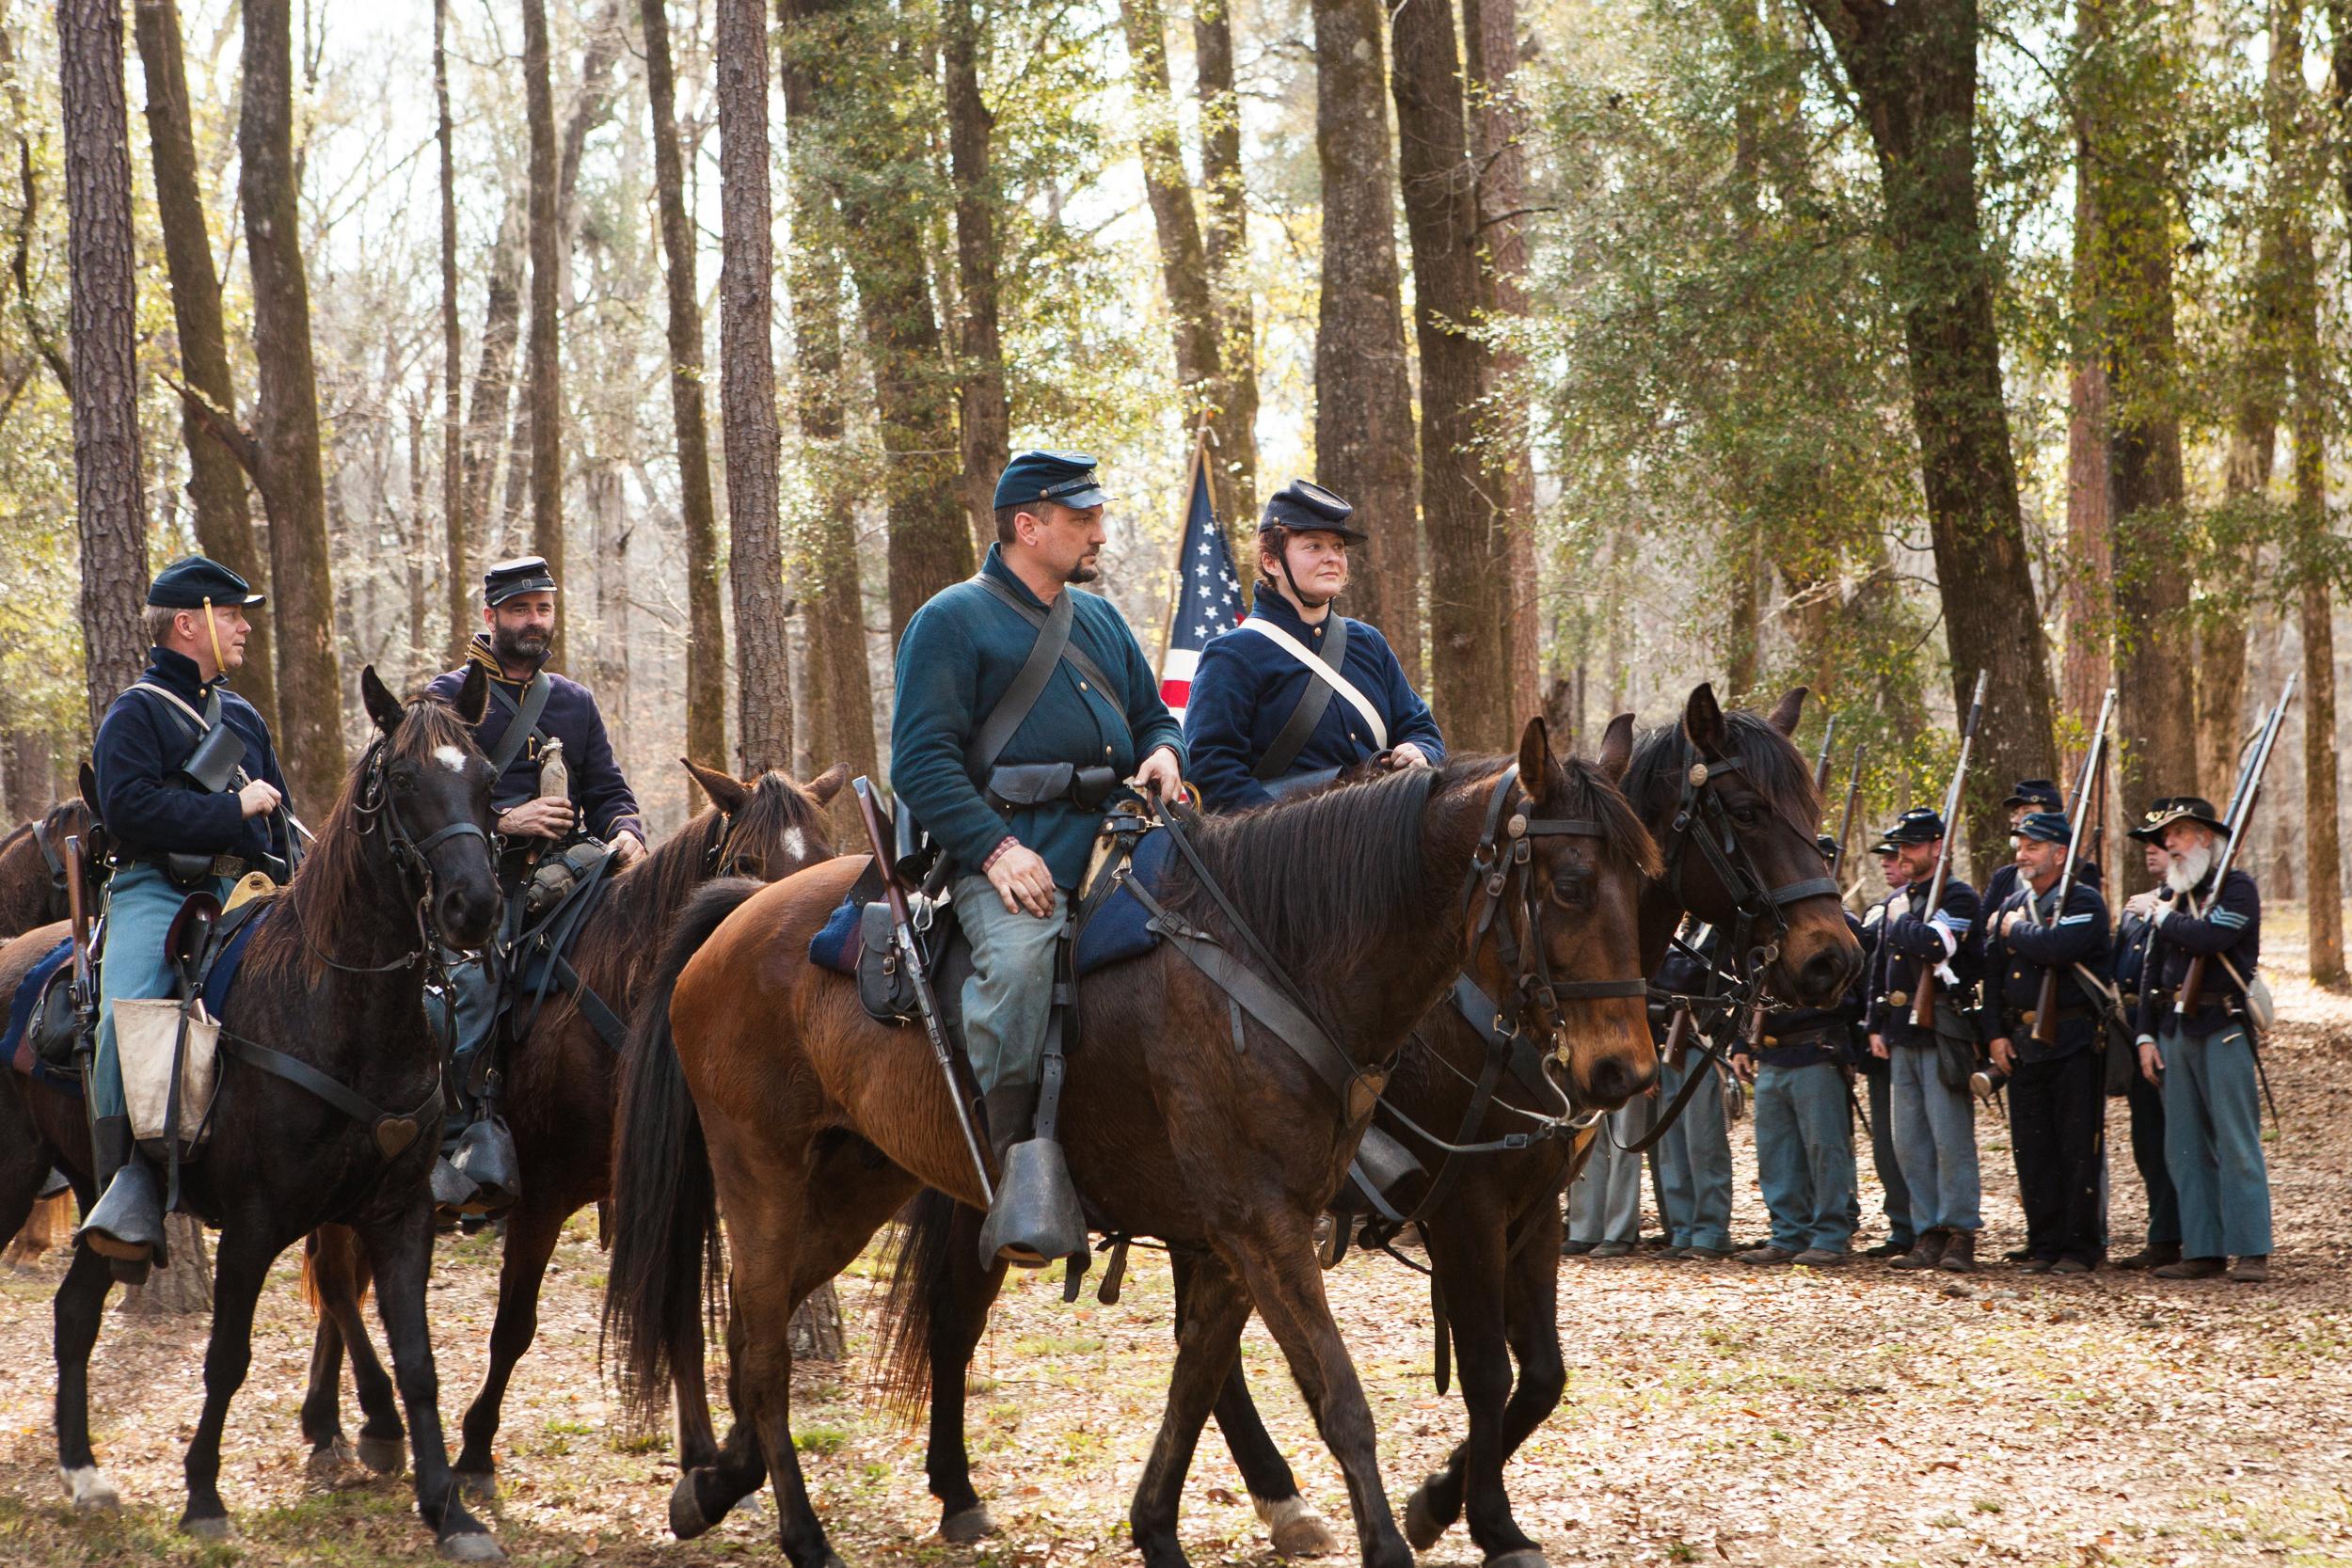 Civil War Reenactment Male Crossdressers 120